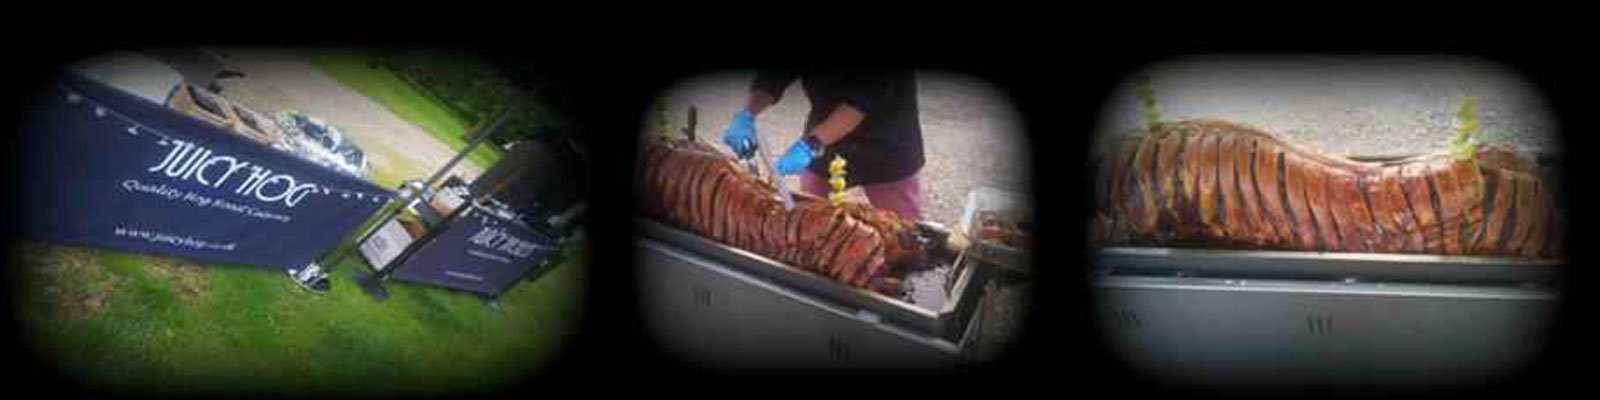 Hog Roast Caterers